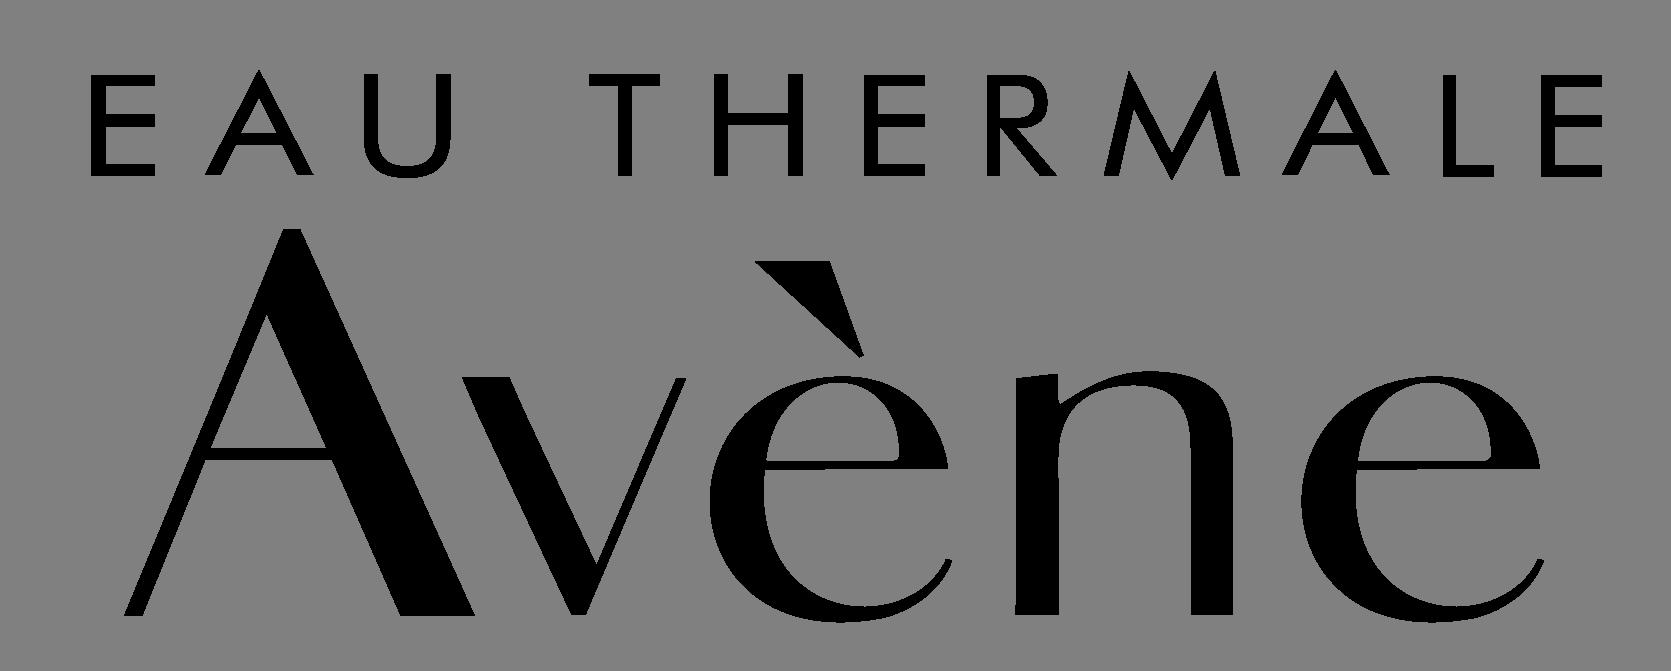 Thermale Avene logo